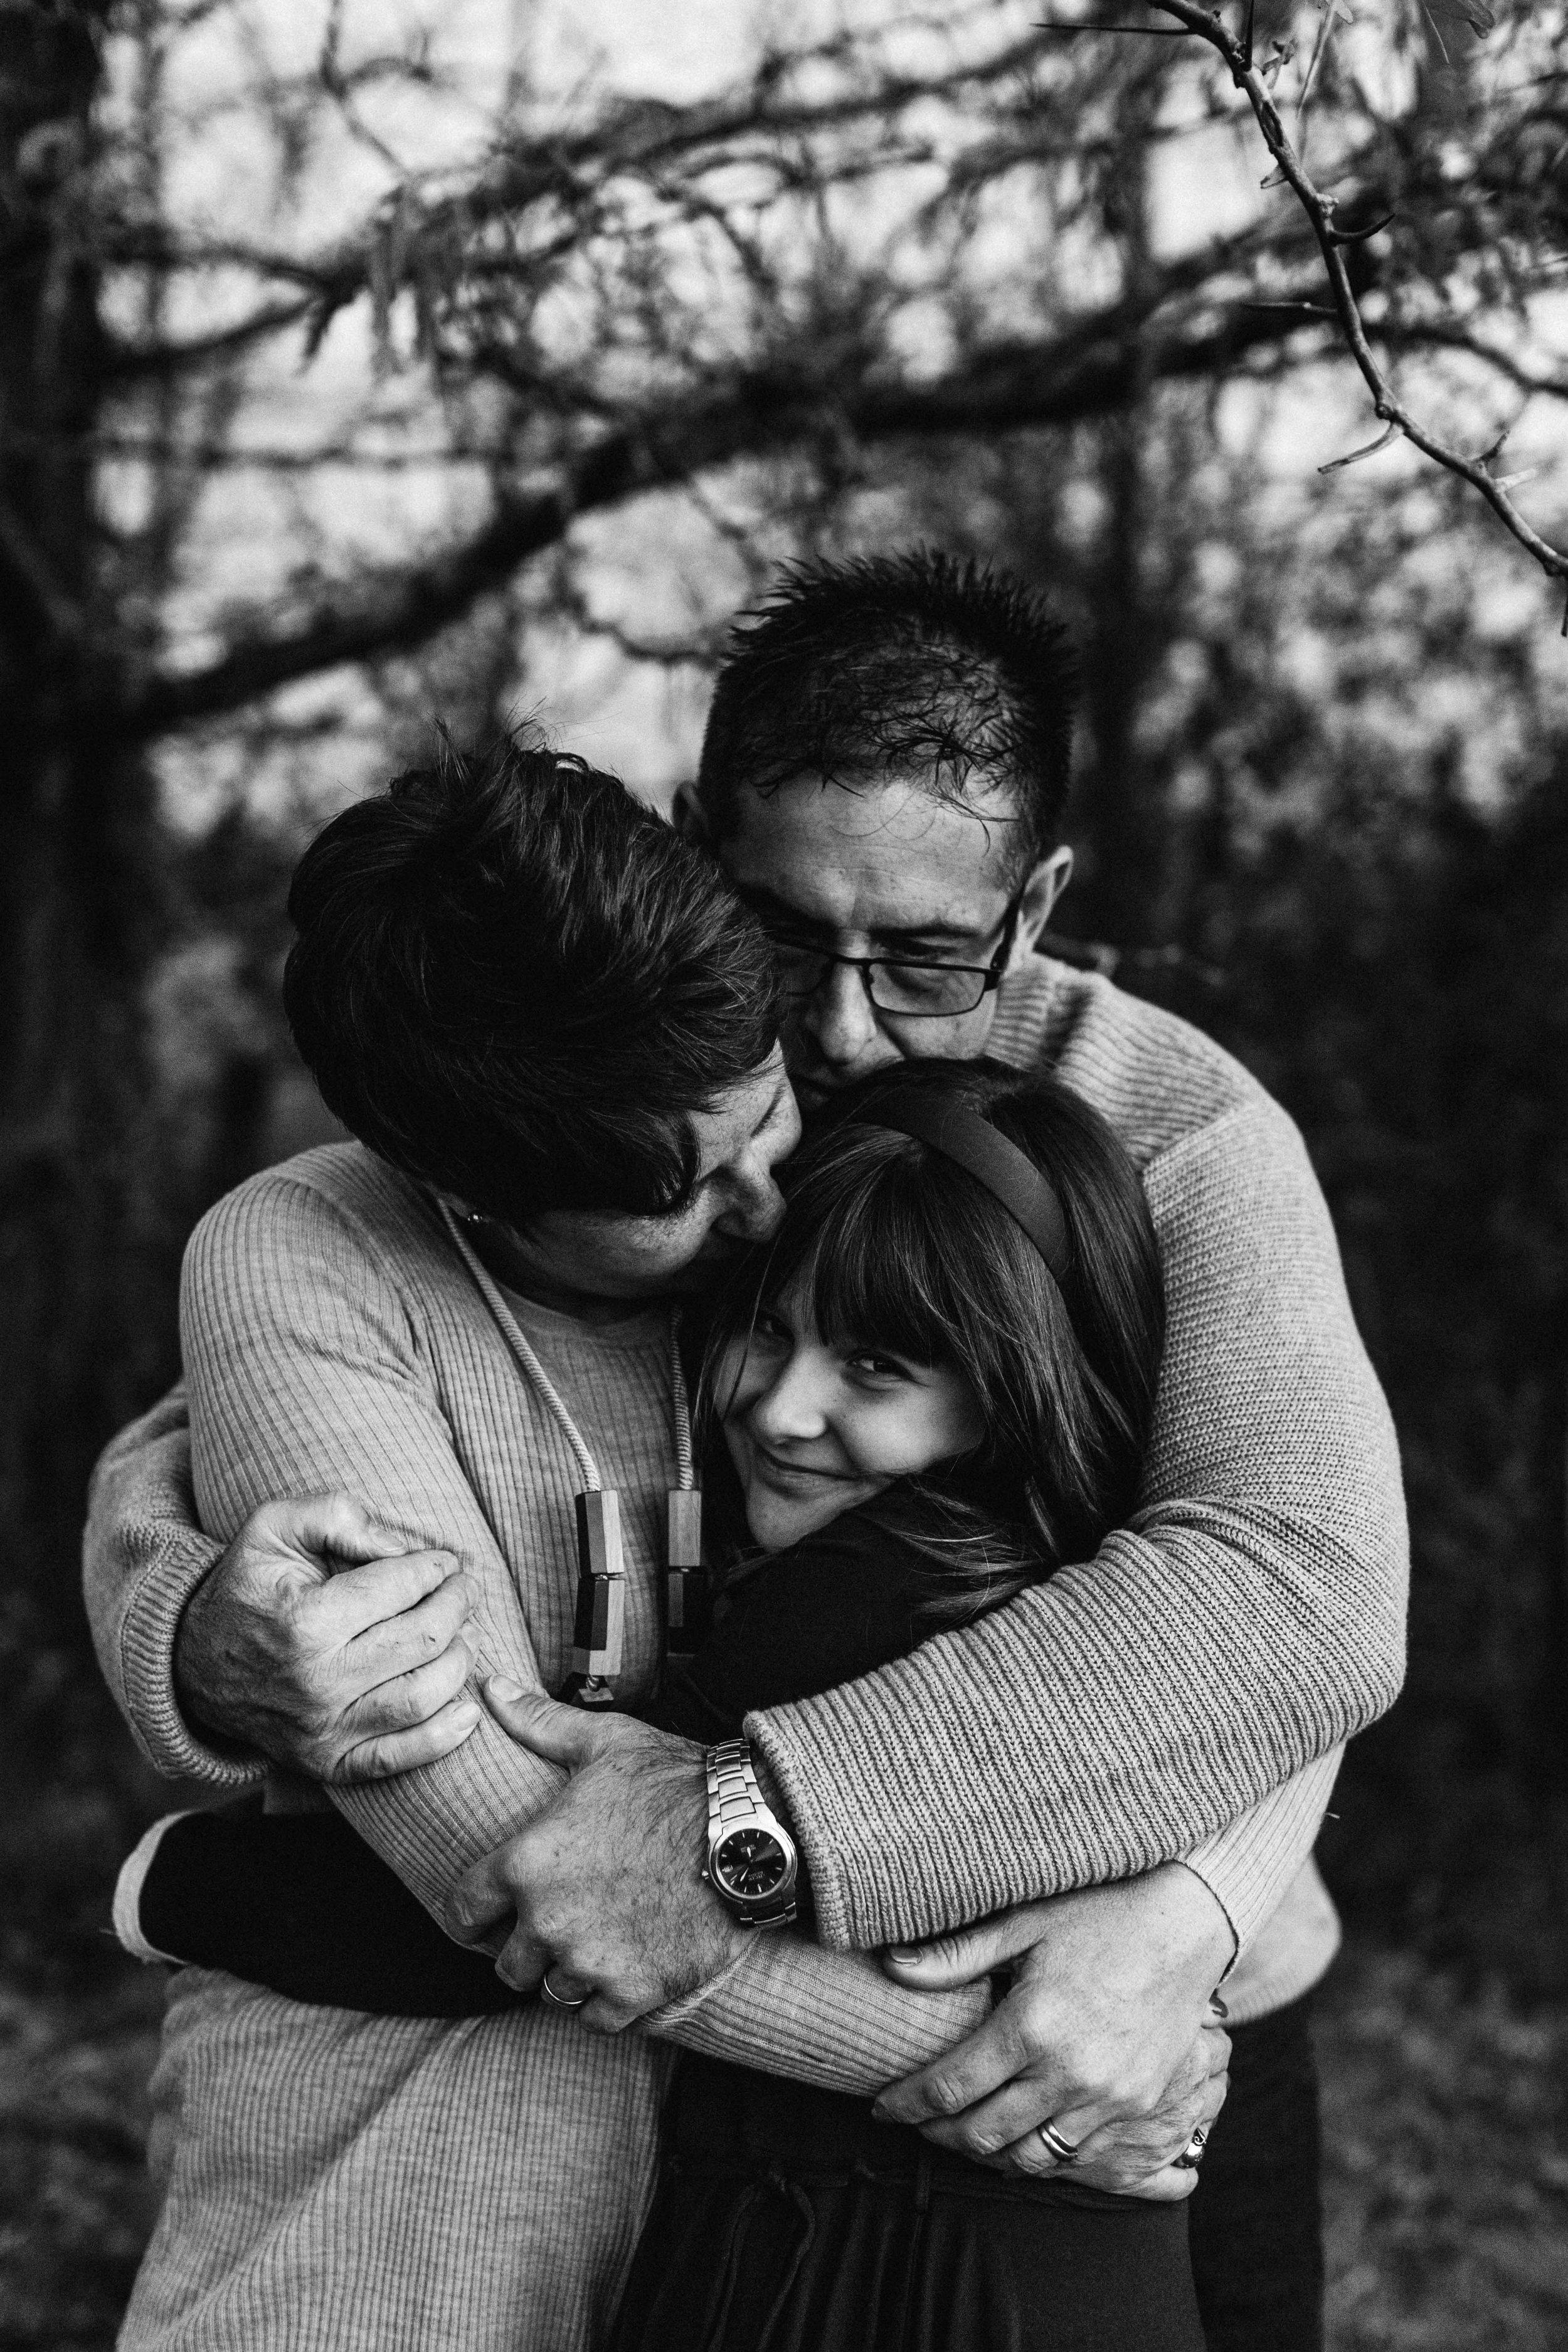 camden-macarthur-family-photography-www.emilyobrienphotography.net-44.jpg